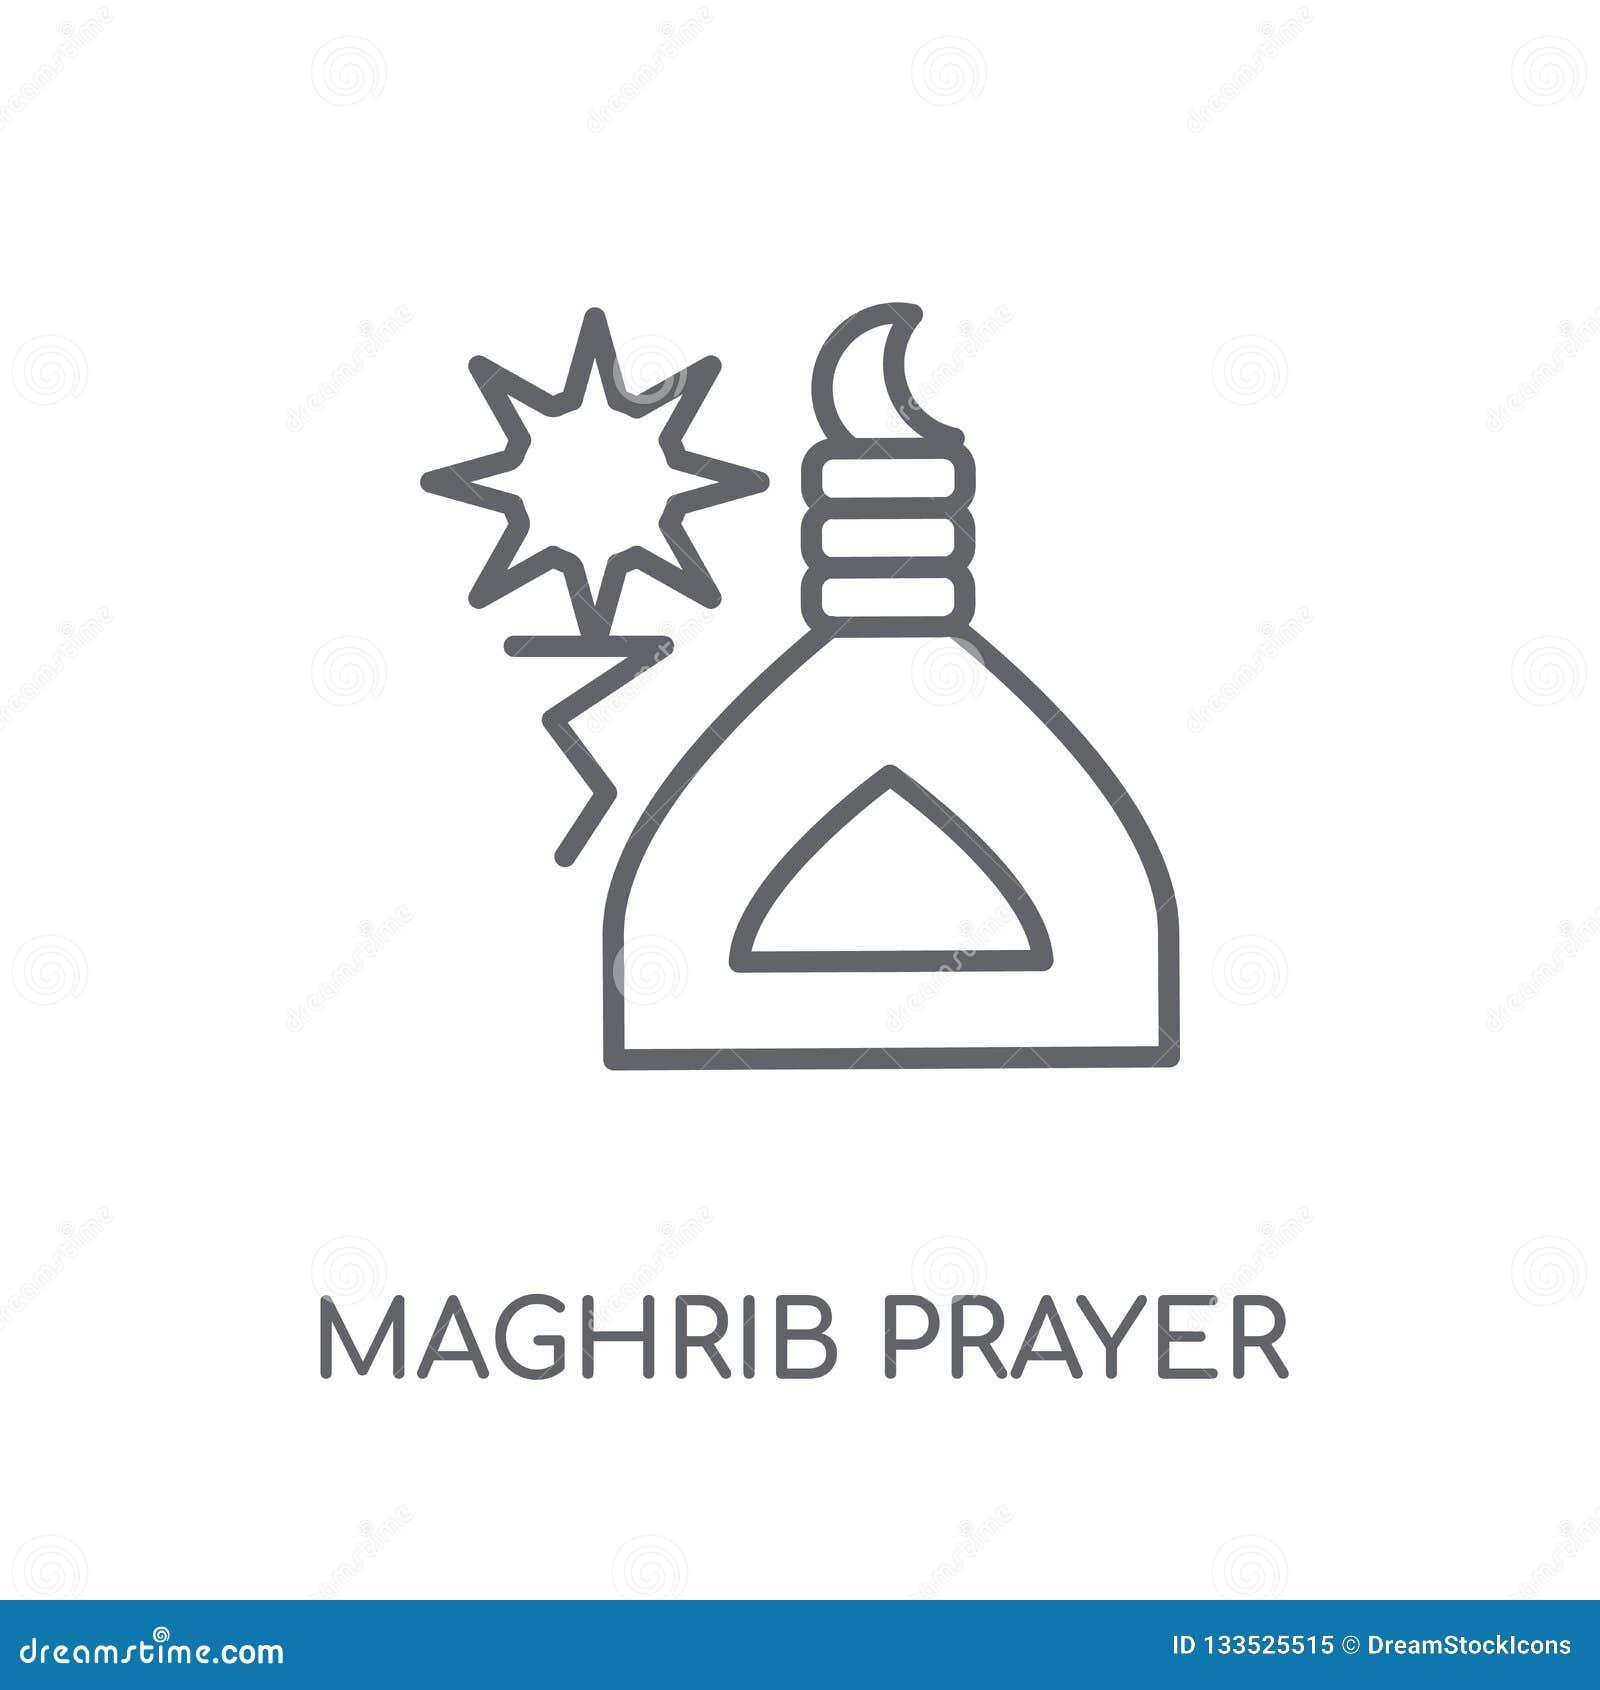 Maghrib Prayer Linear Icon  Modern Outline Maghrib Prayer Logo C